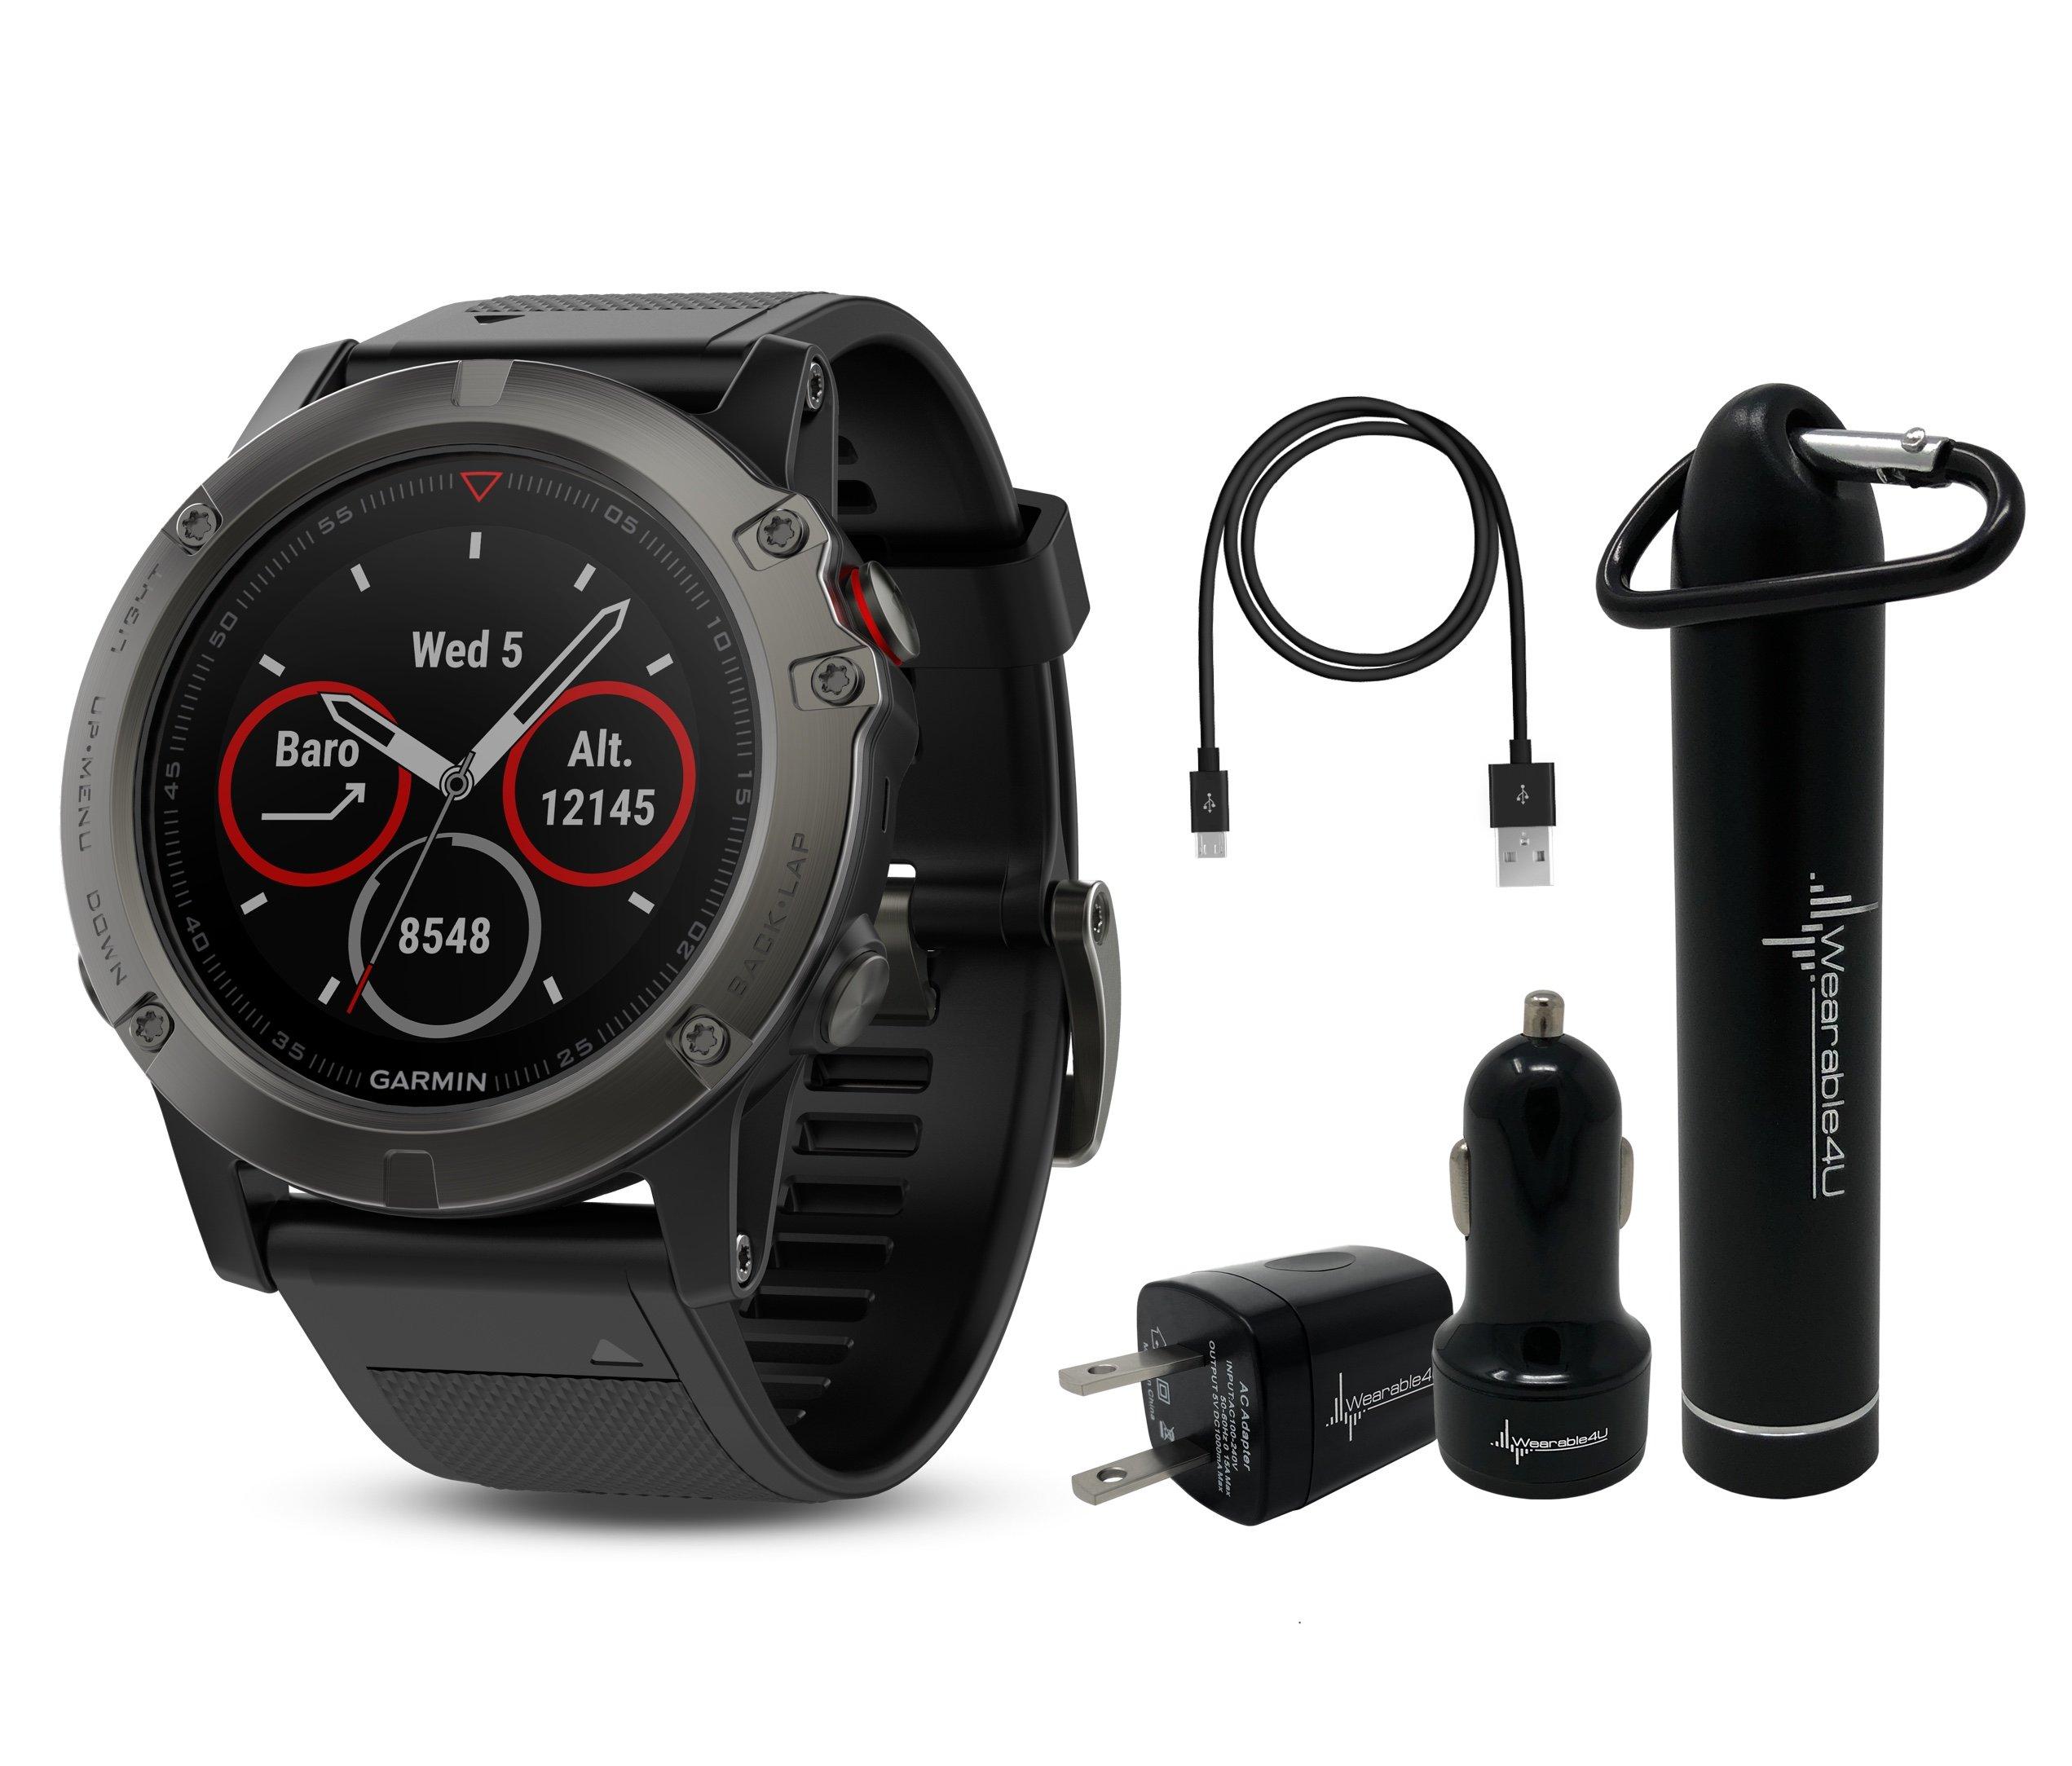 Garmin Fenix 5X Sapphire Multisport GPS Watch with Preloaded Topo Maps and Wearable4U Ultimate Power Bundle (Slate Gray with Black Band)